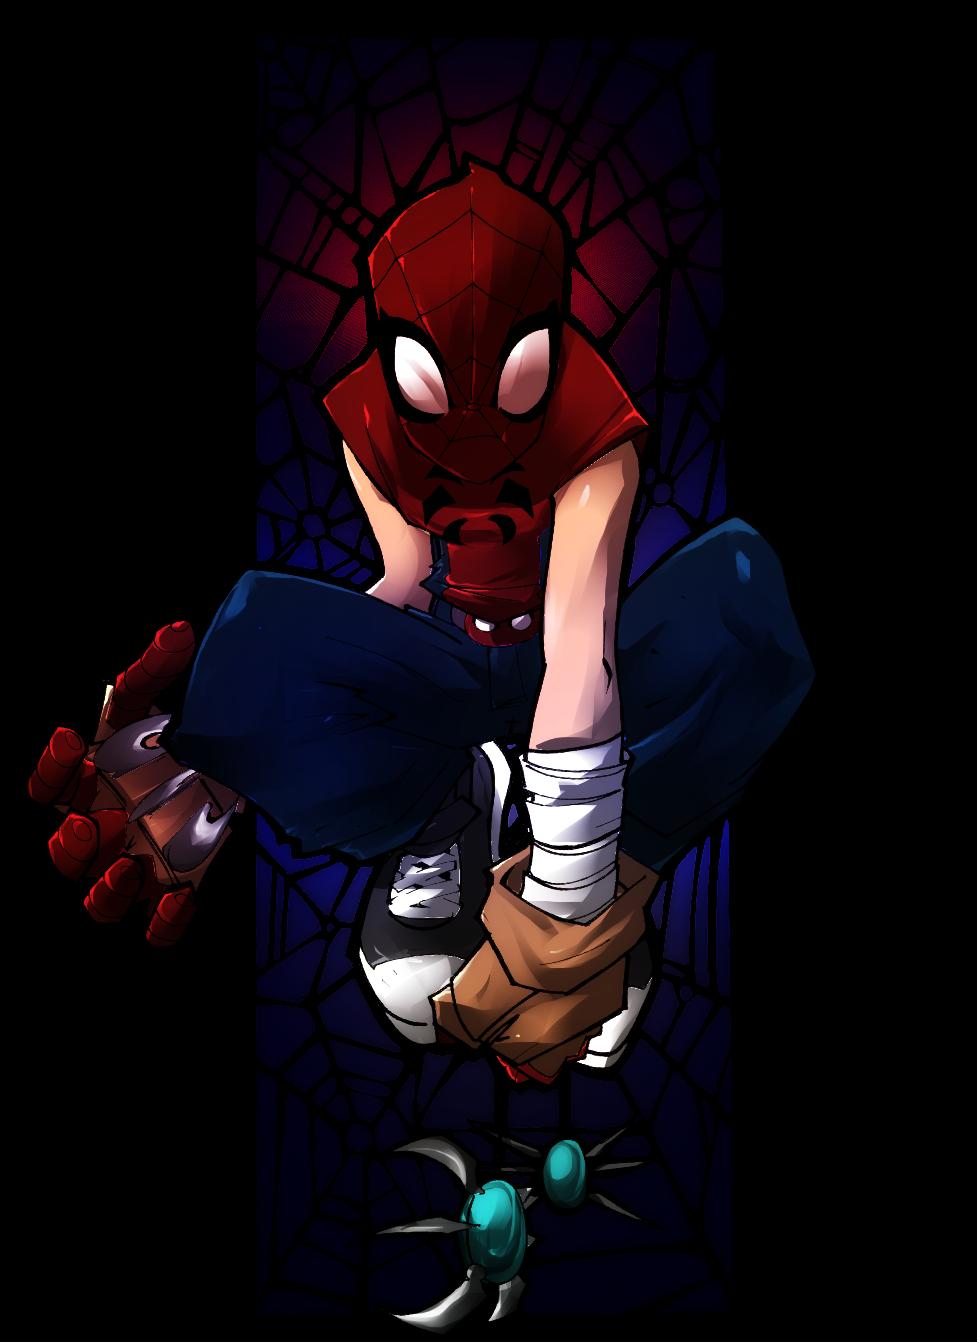 Mangaverse Spider Man ... Mangaverse Spider Man Wallpaper